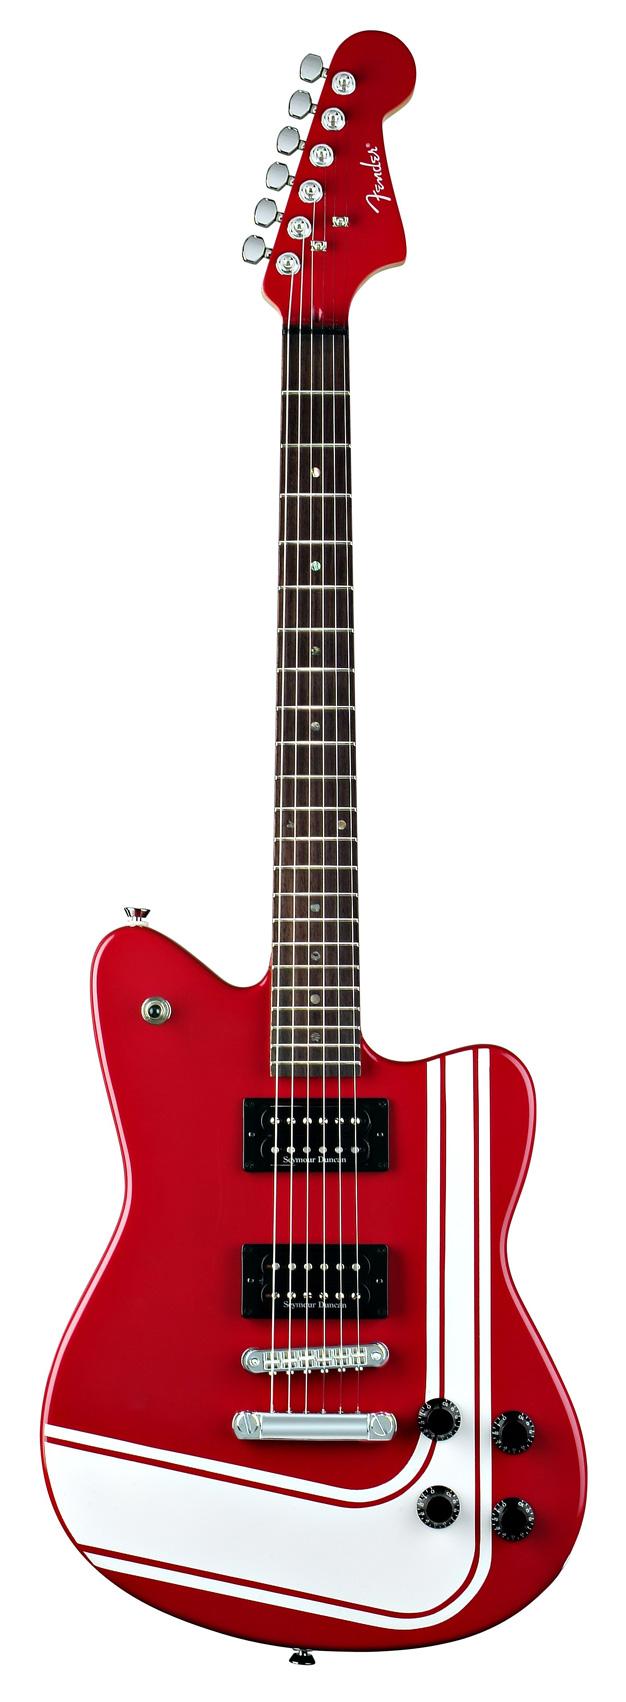 Fender toronado gt hh review musicradar sciox Choice Image